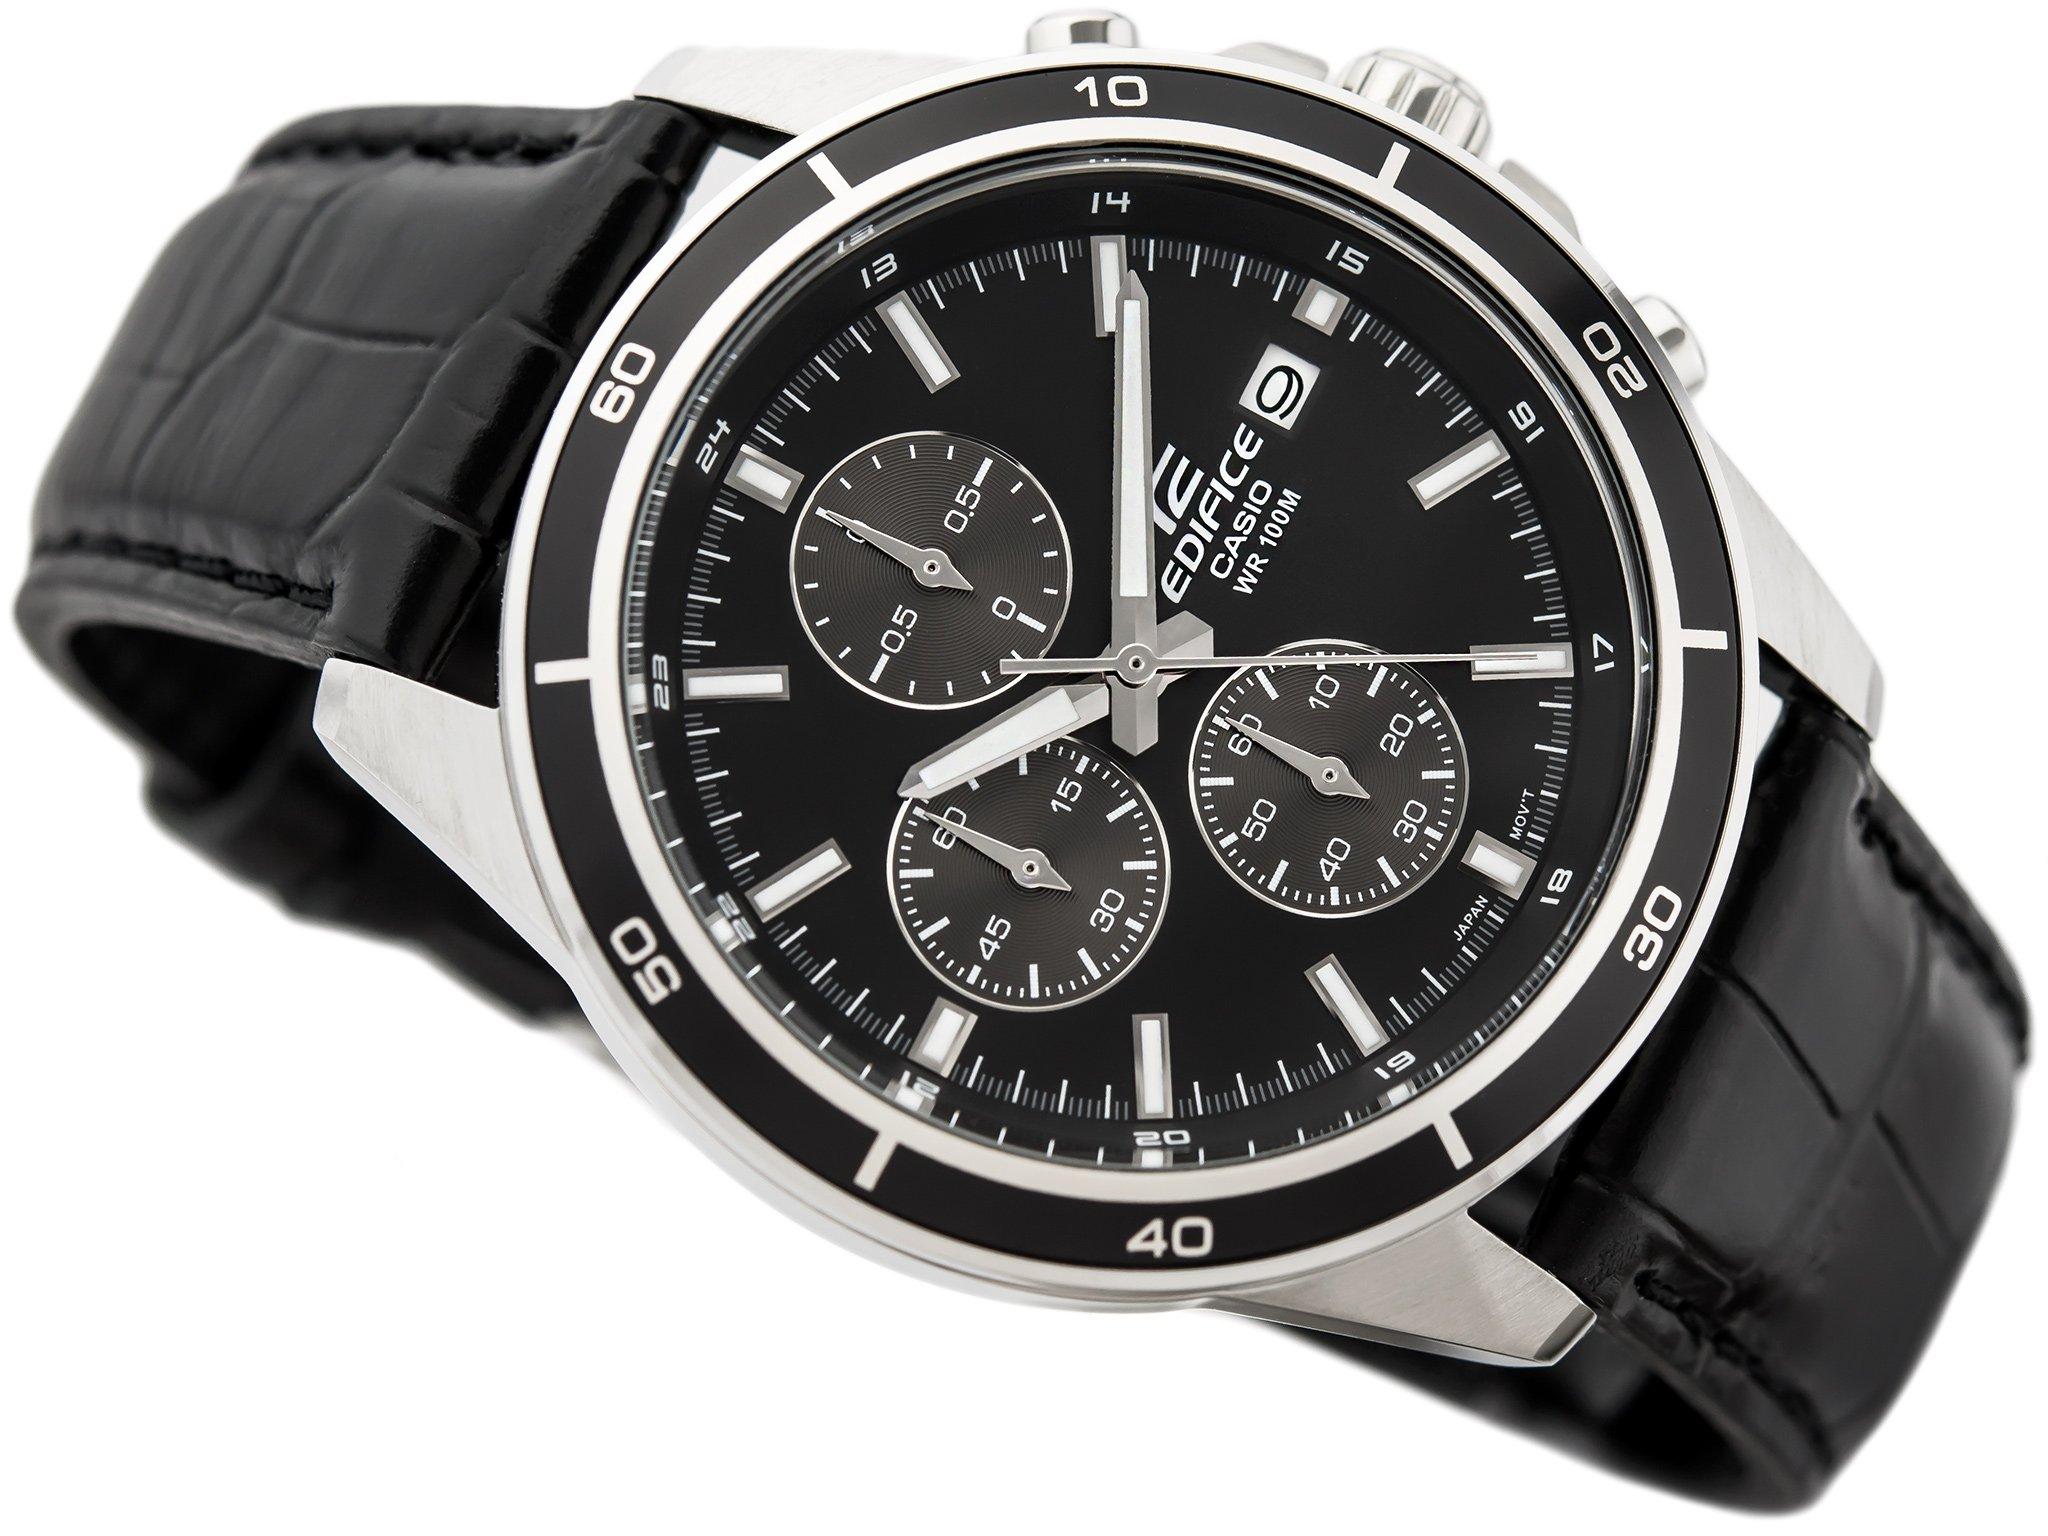 Zegarek męski CASIO EFR 526L 1AV 296,00 zł cena tanio